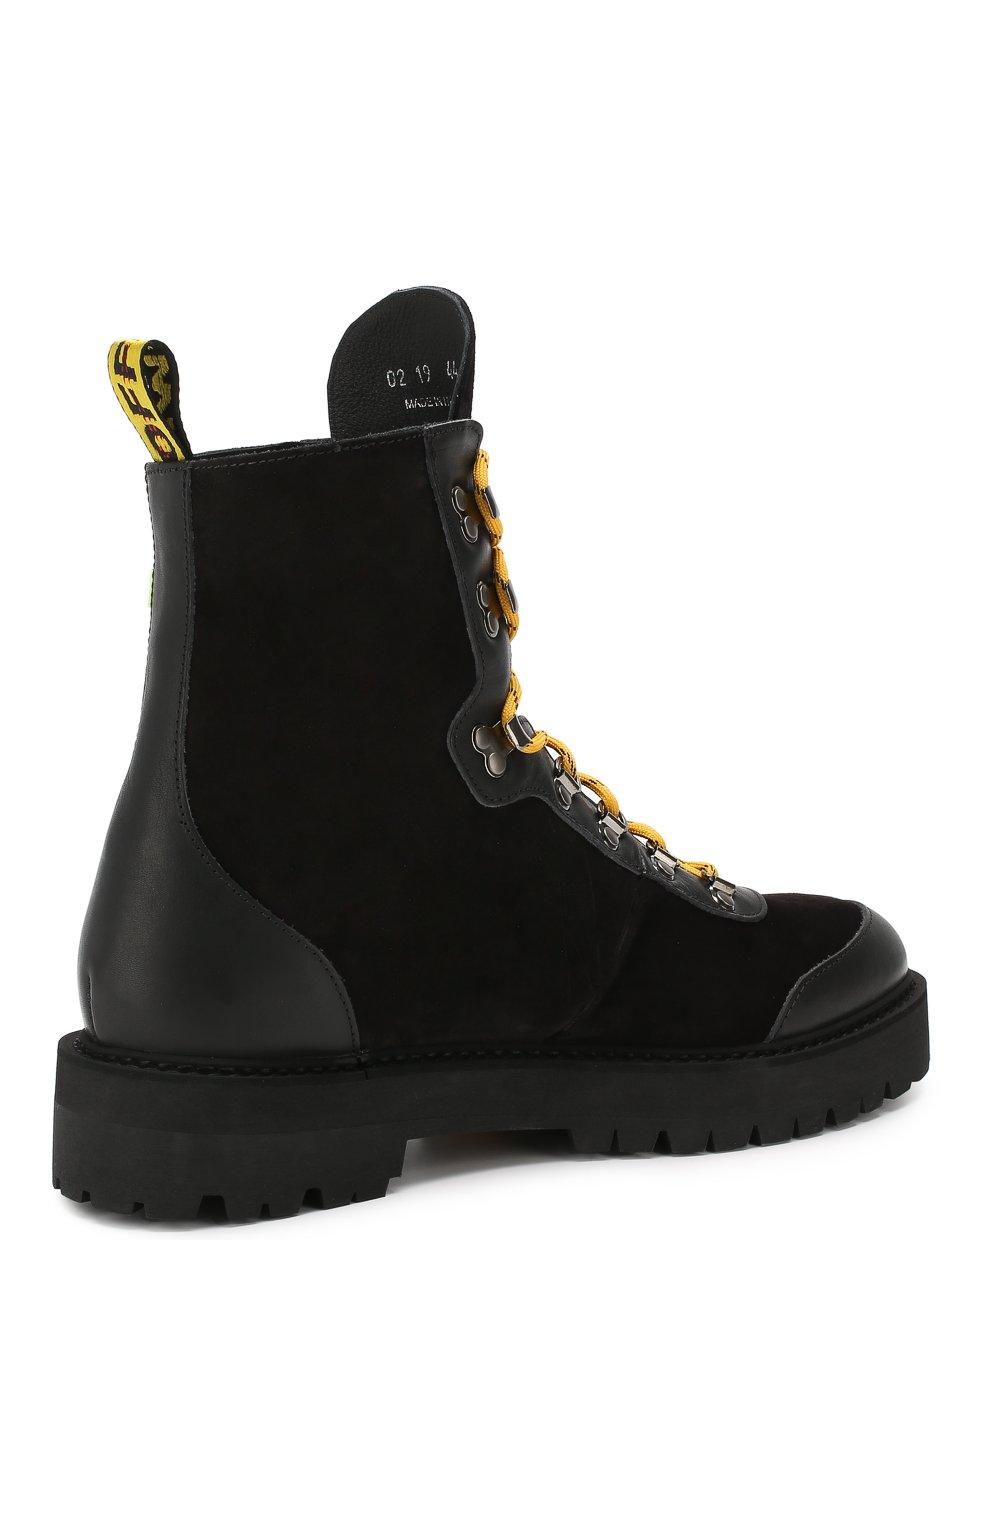 Мужские замшевые ботинки OFF-WHITE черного цвета, арт. 0MIA121E19D680021000 | Фото 4